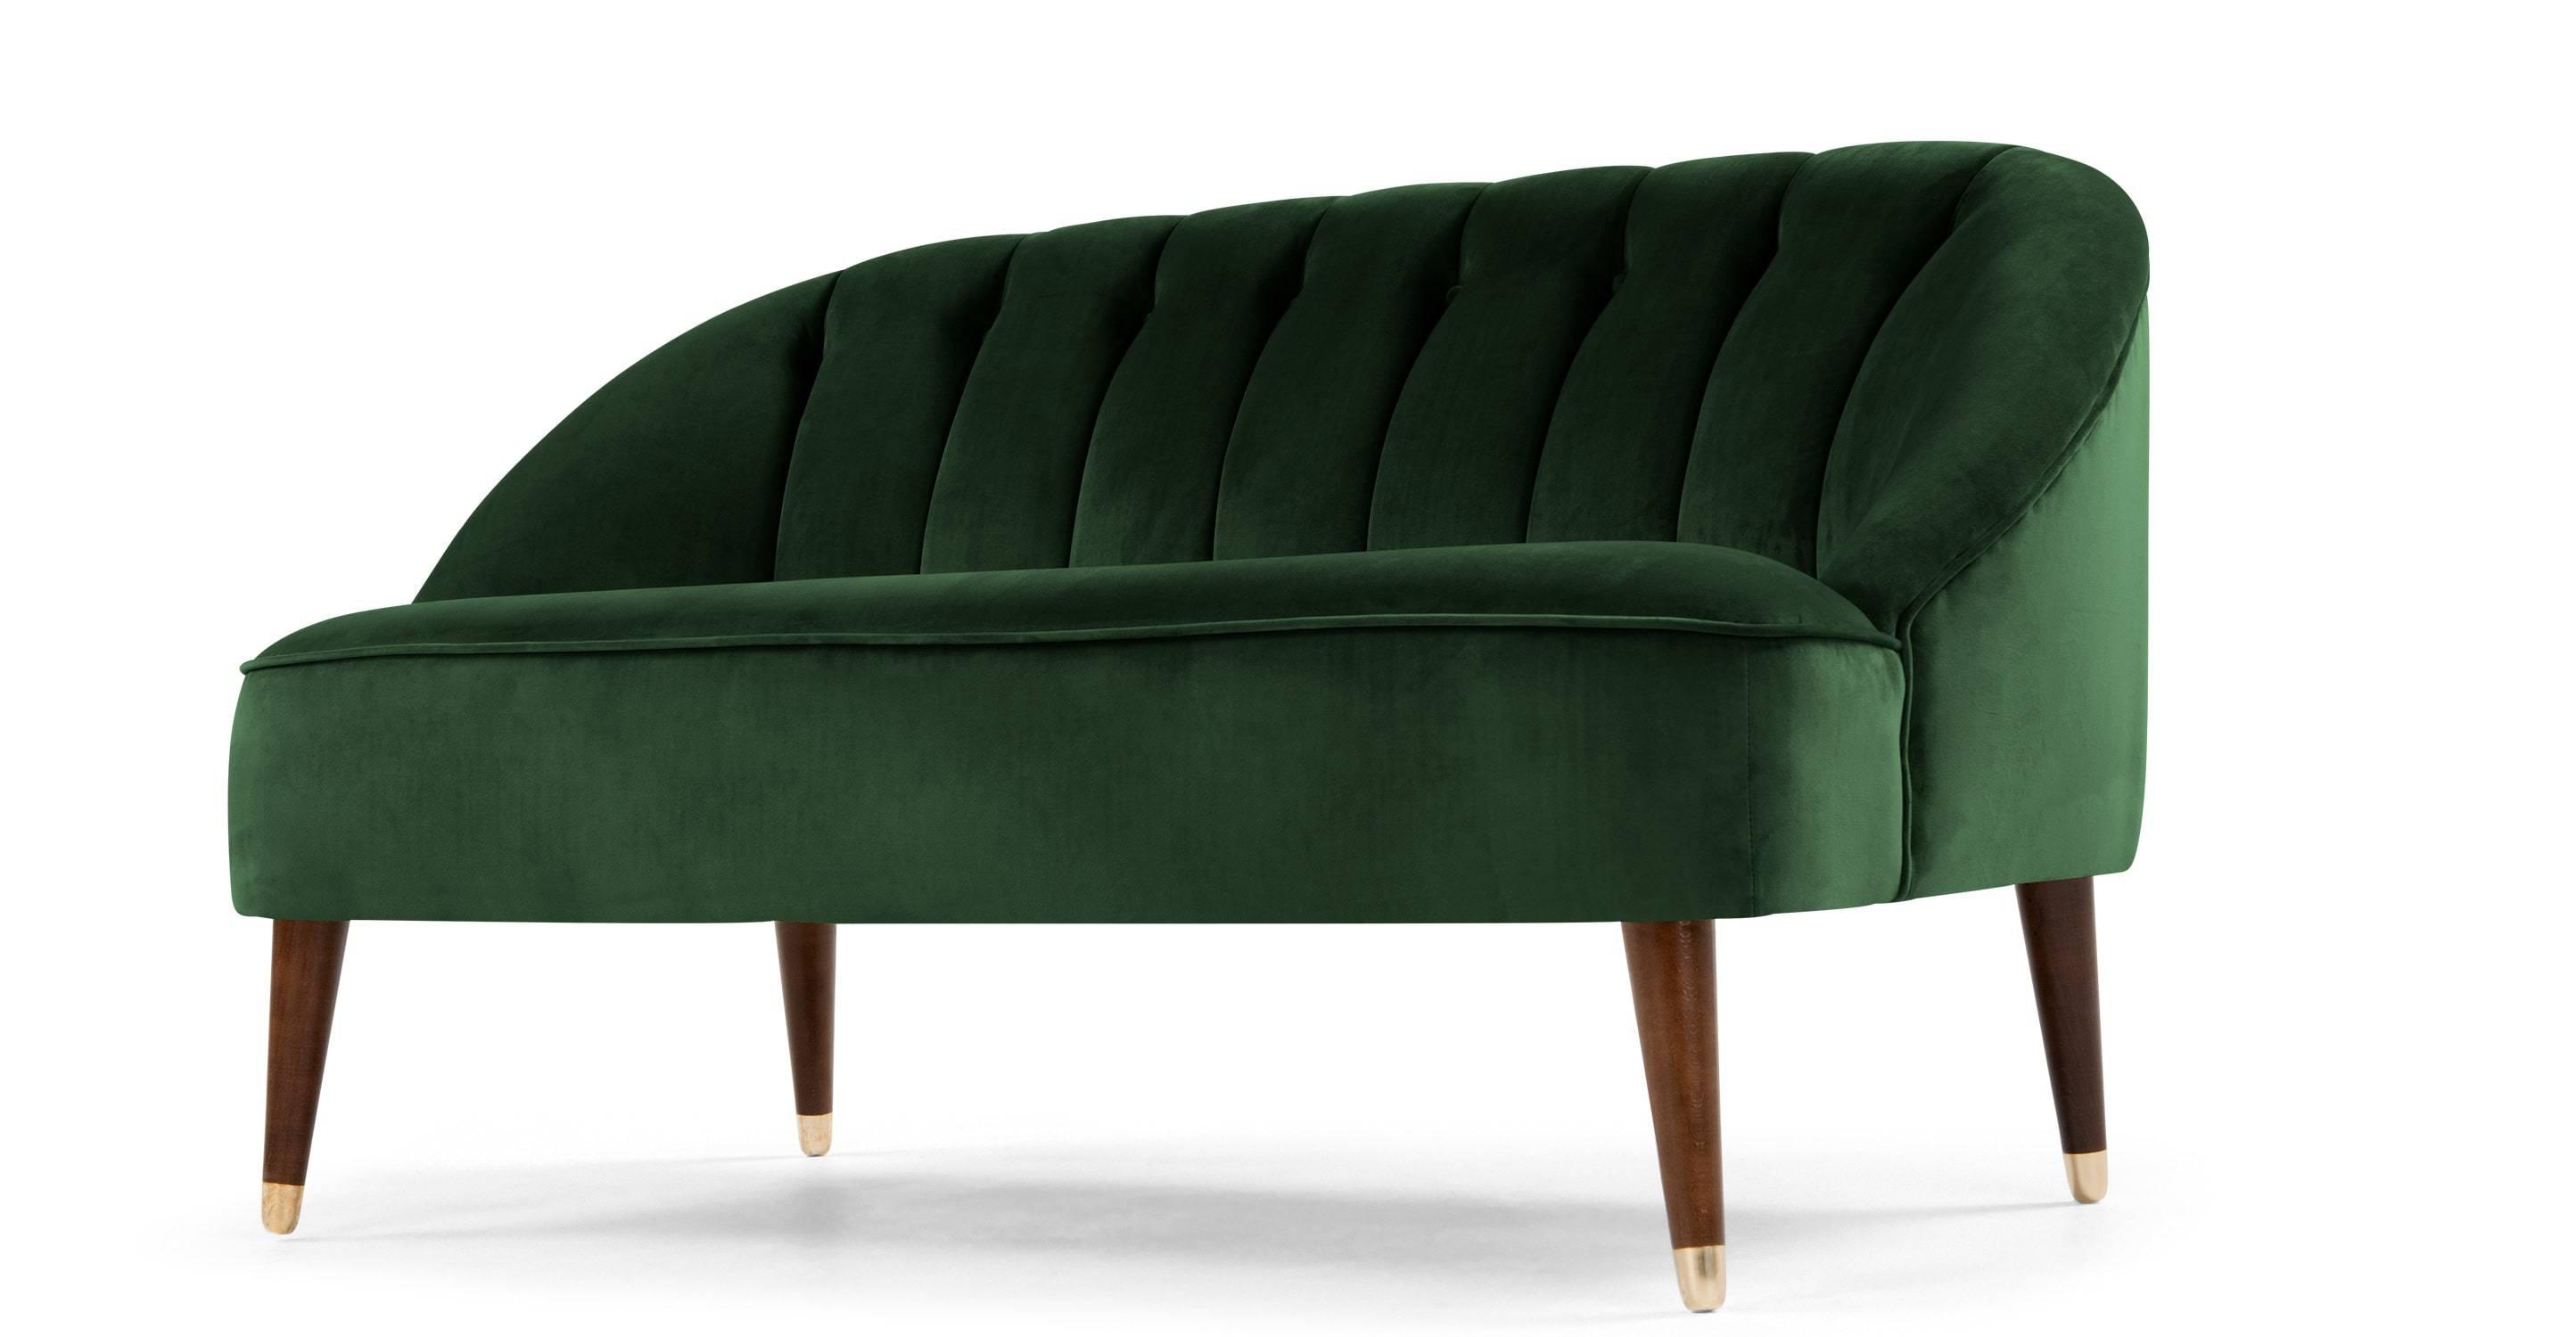 Sofas Center : Carl Hansen Ch162 Sofa Small Seater Sofas For In Small 2 Seater Sofas (View 21 of 30)